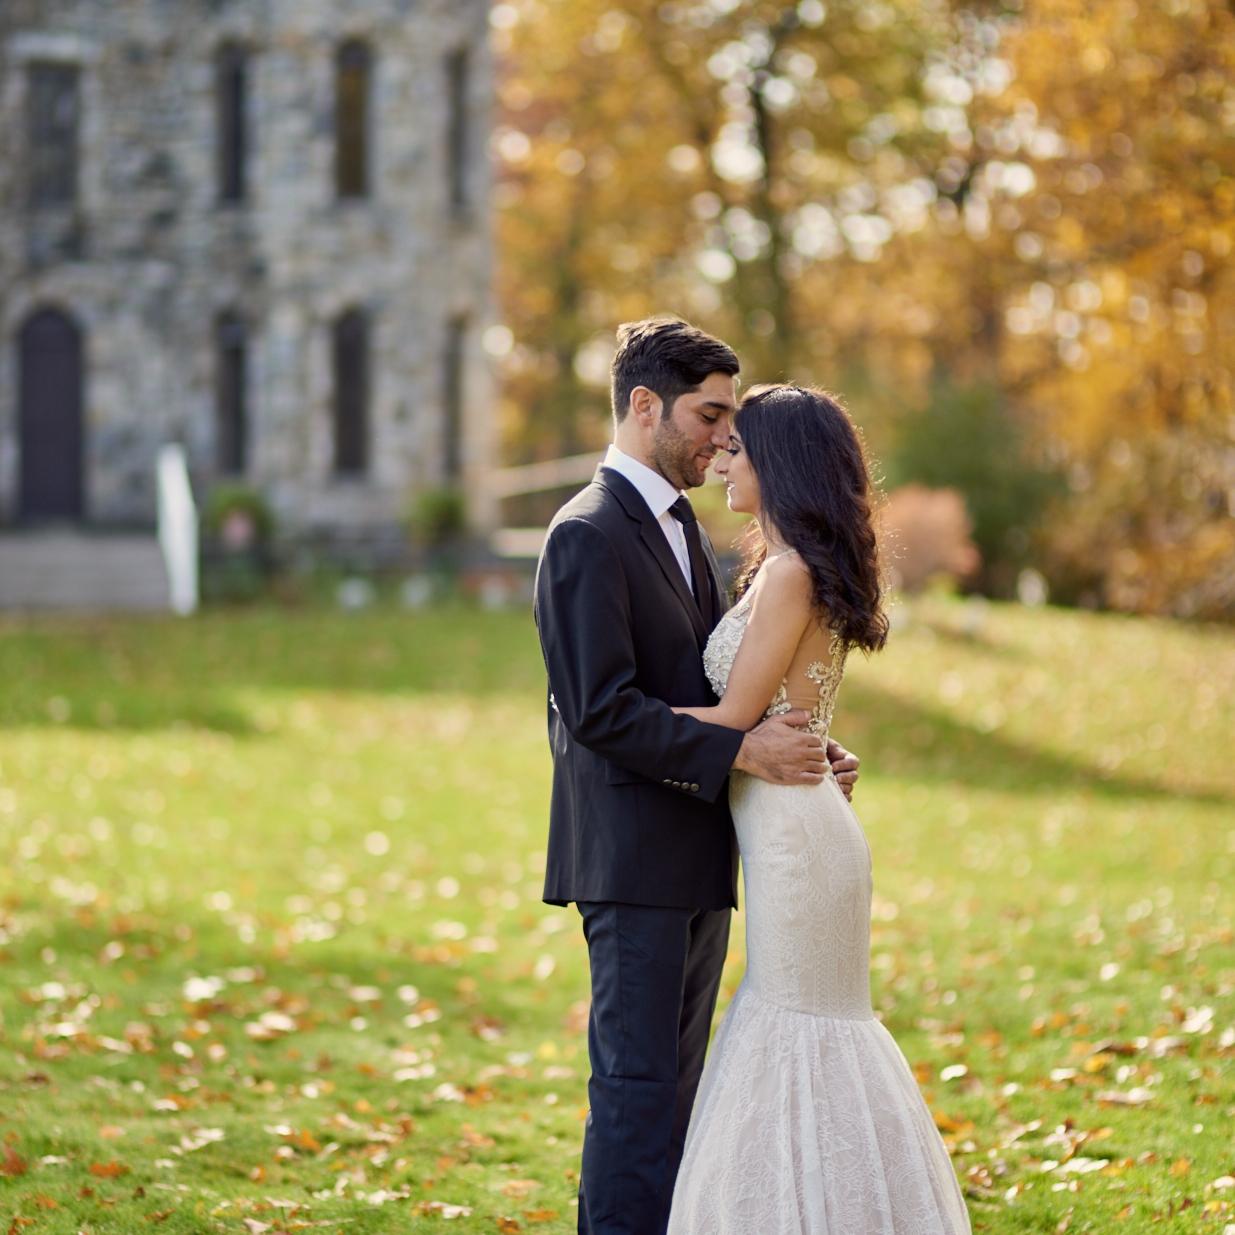 Kristin and Chris's Fall Post Wedding Photo session at Winnekenni Castle in Haverhill, Massachusetts